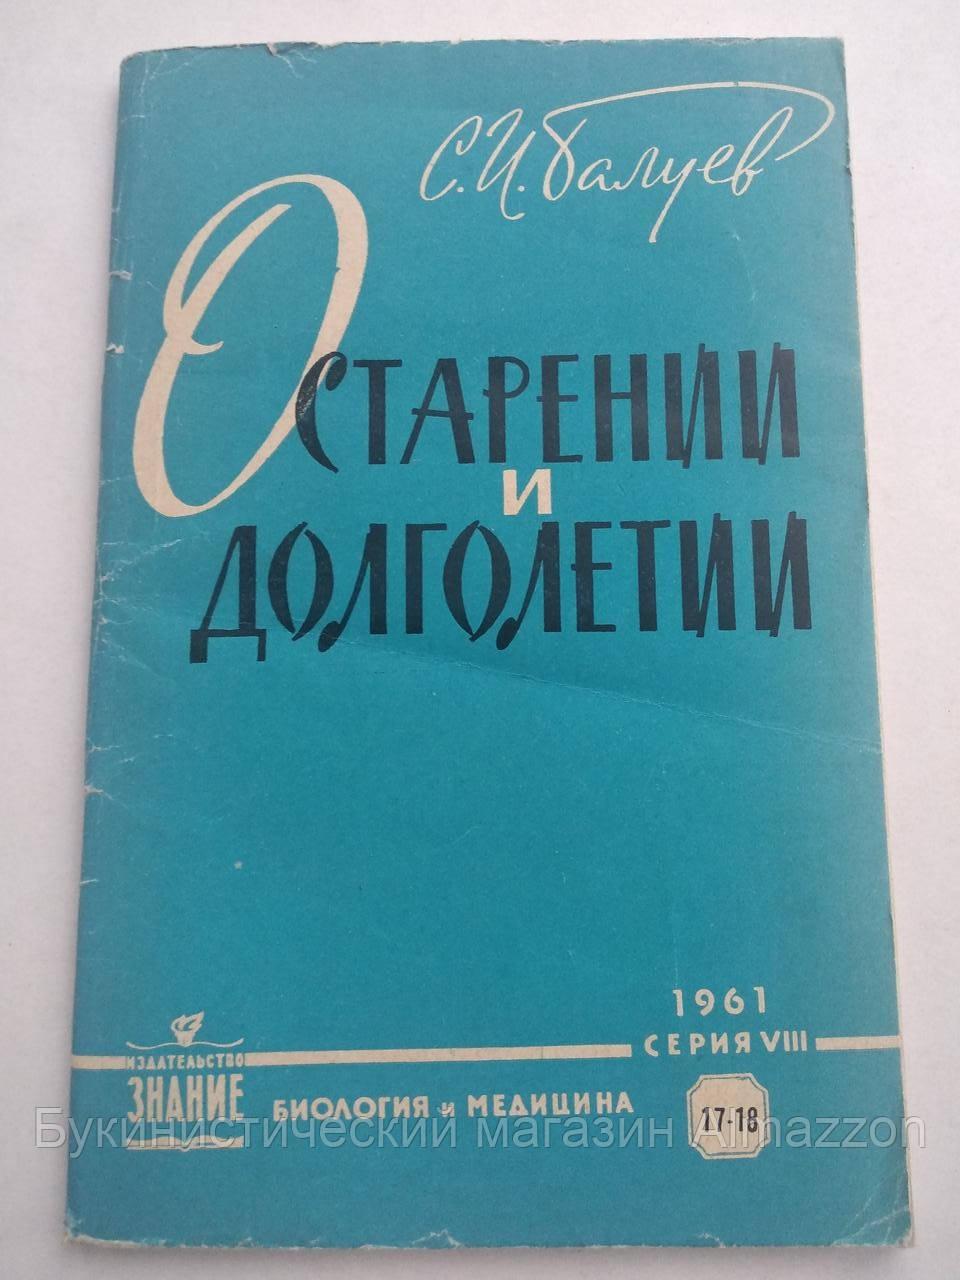 О старении и долголетии. Серия:биология и медицина. С.И.Балуев. 1961 год. Знание